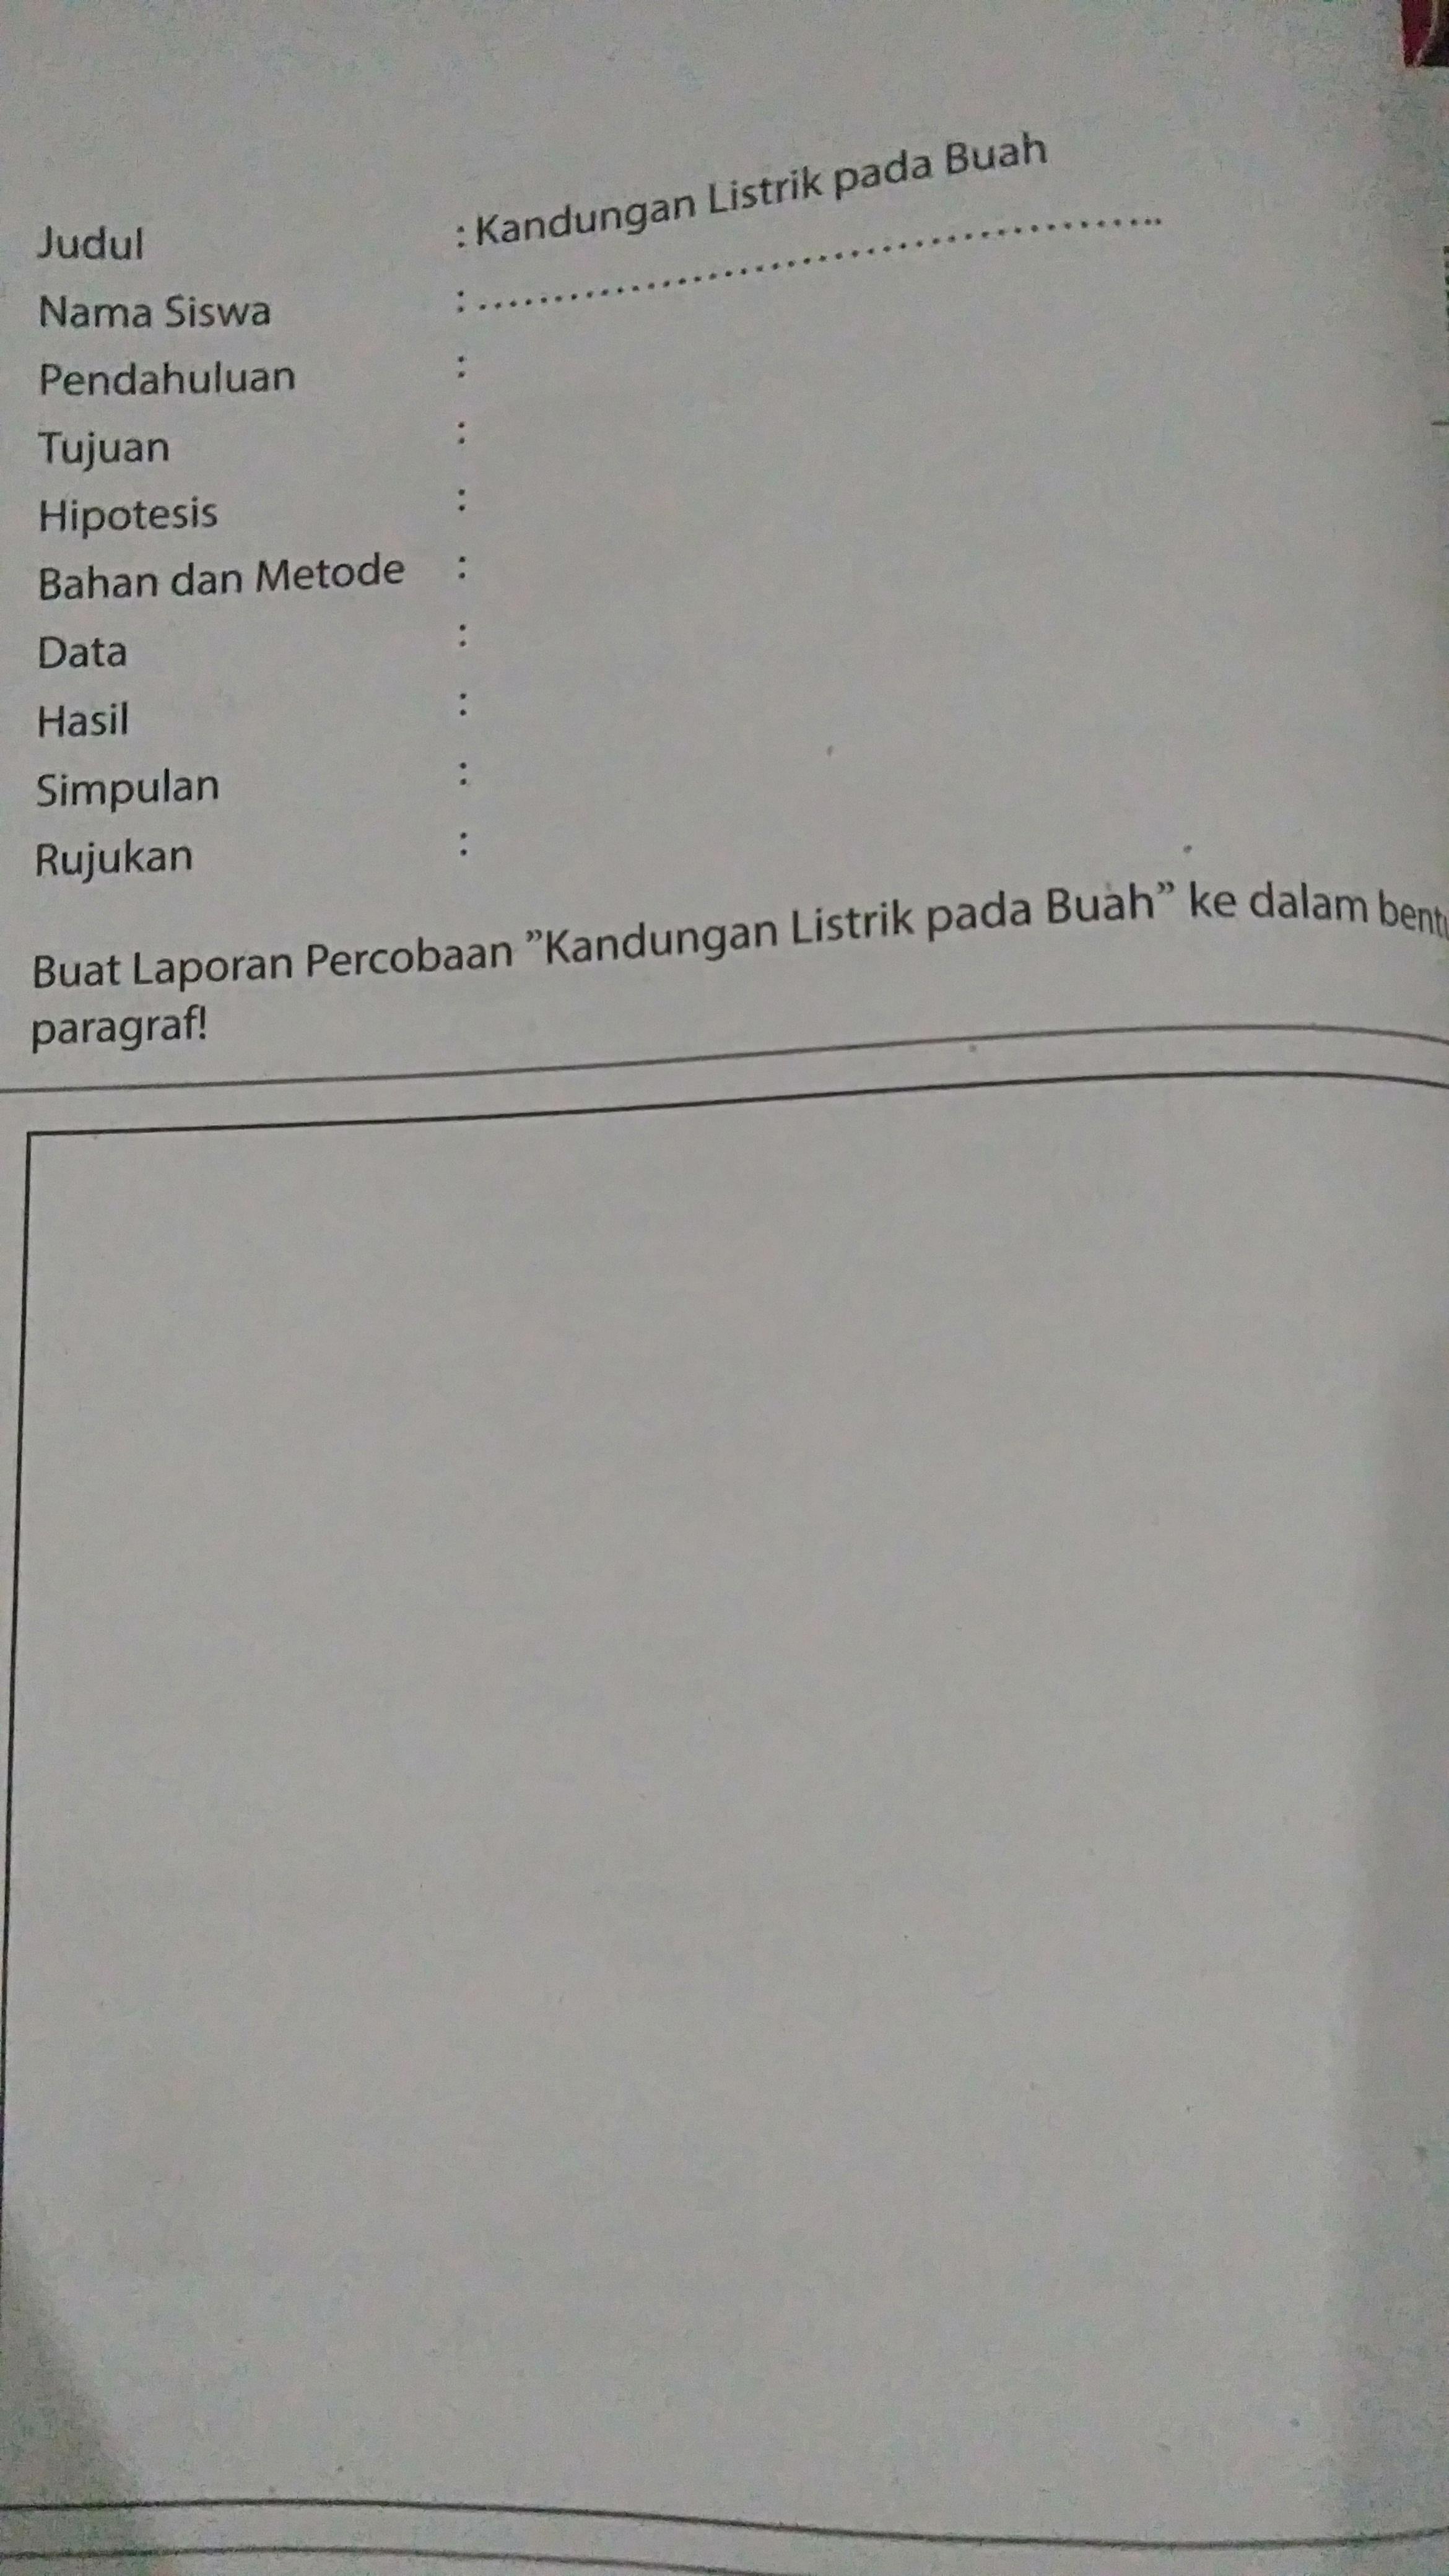 Bahasa Indonesia Semester 1 Kelas 9 Halaman 30 Brainly Co Id